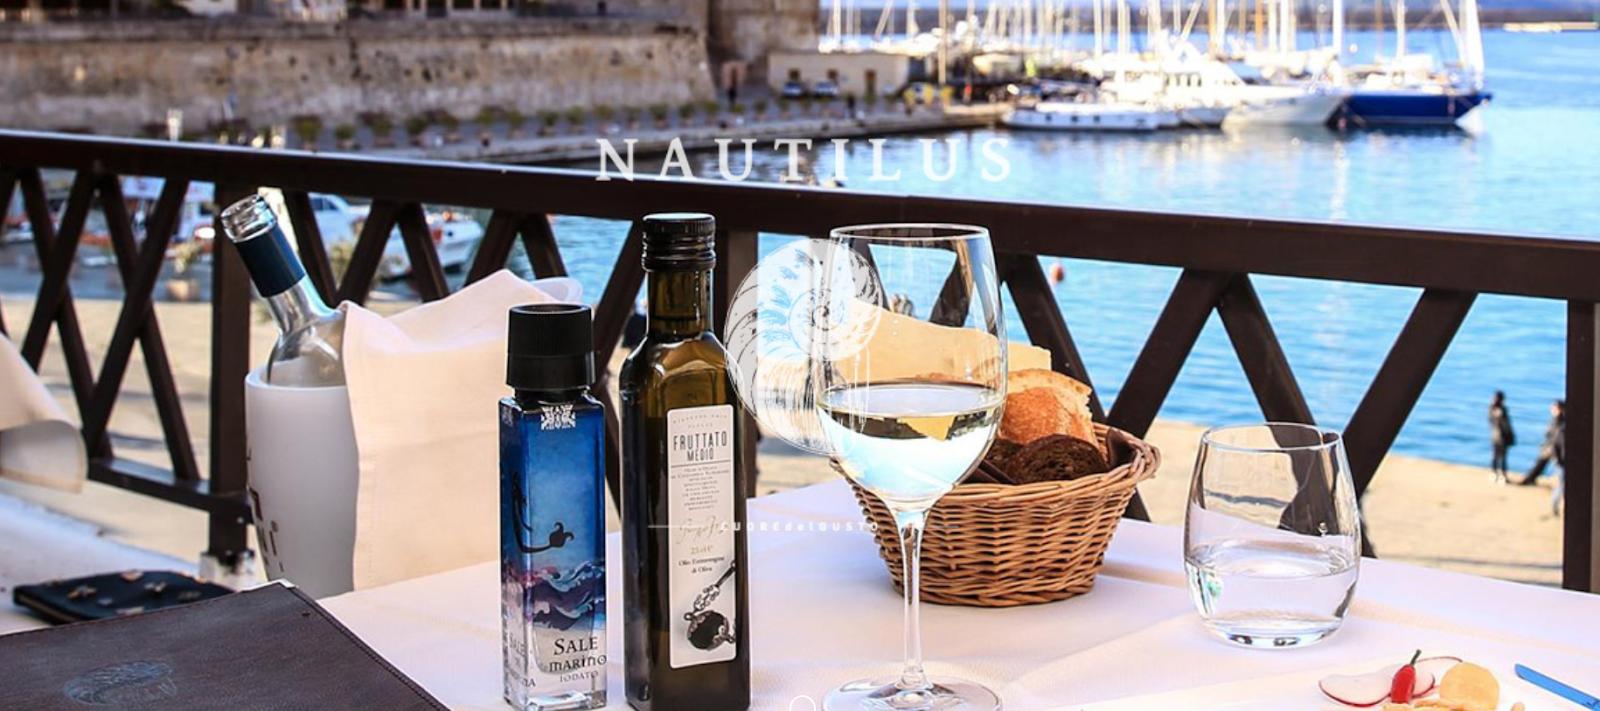 GJW Blog - Sardinia Nautilus